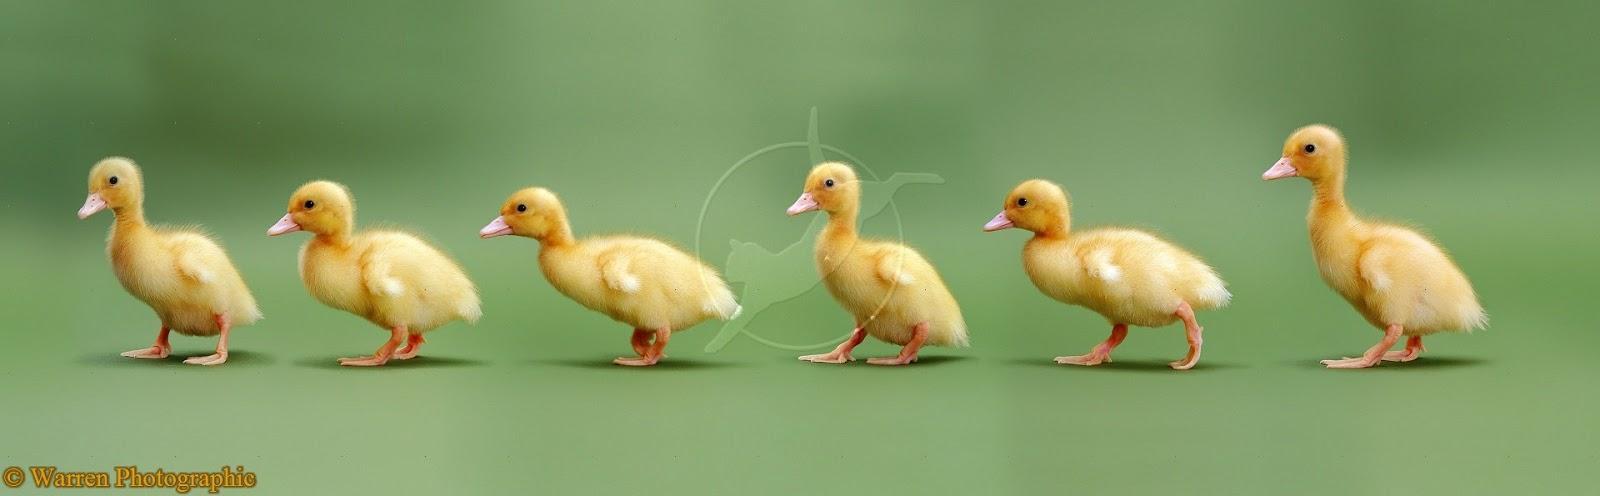 ducklings wallpapers free hd wallpapers